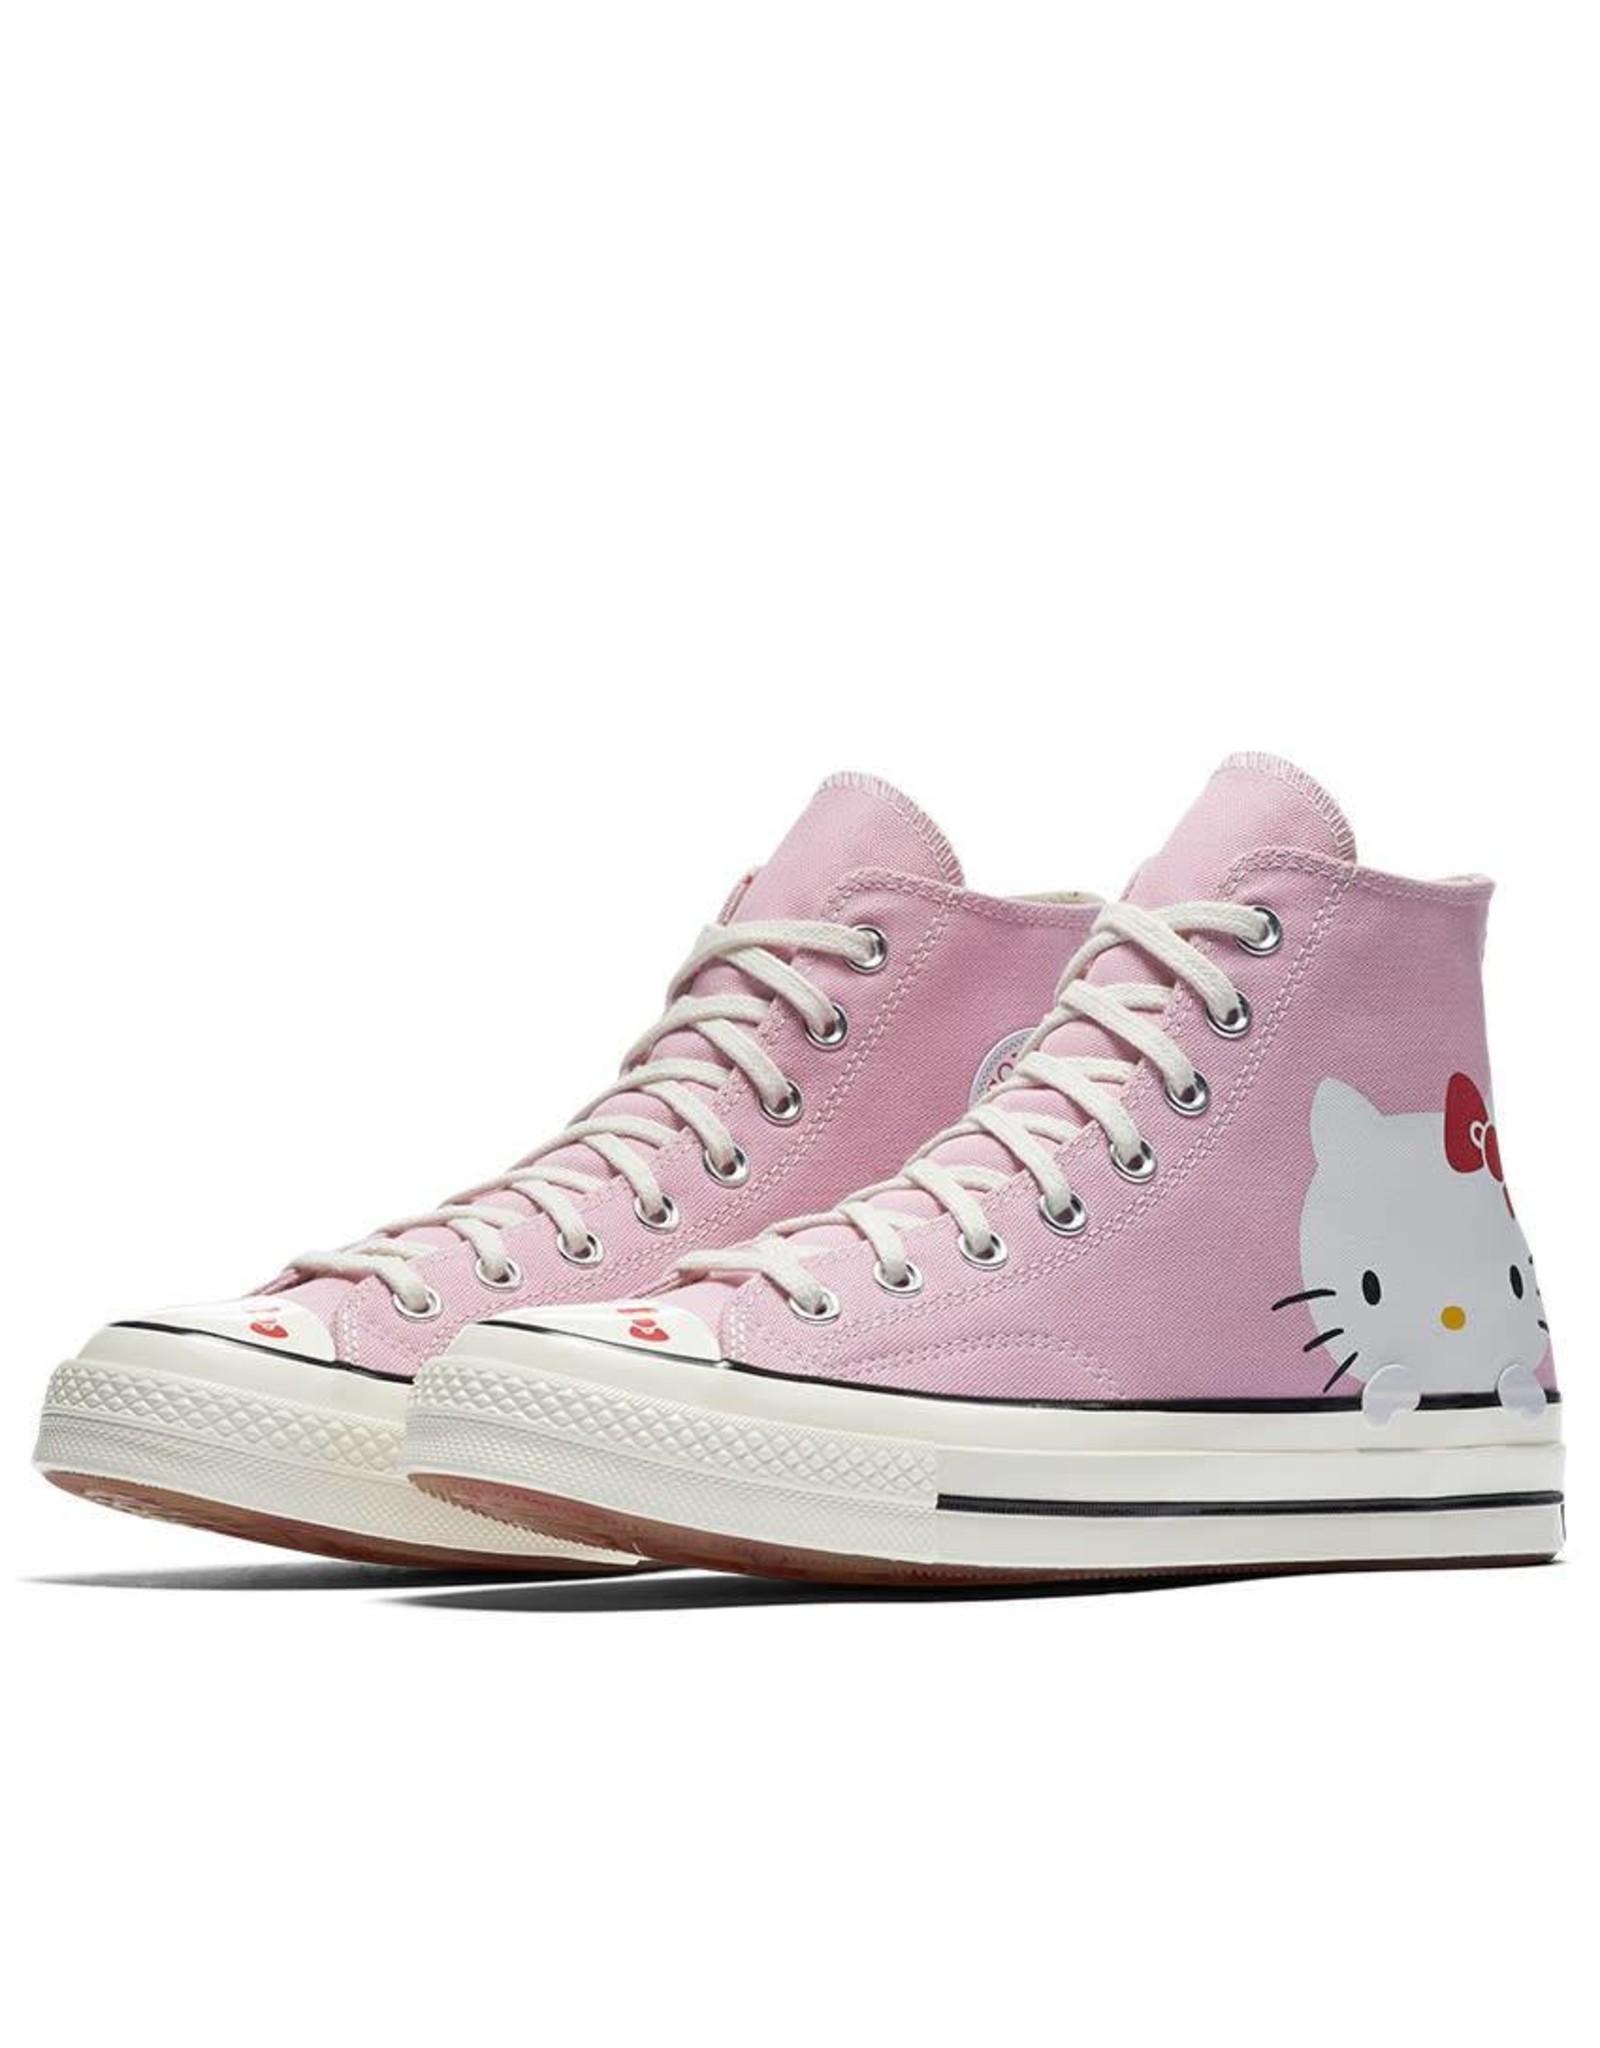 CONVERSE CHUCK TAYLOR 70 HI PINK PRISM/EGRET/WHITE HELLO KITTY C870HK-162936C